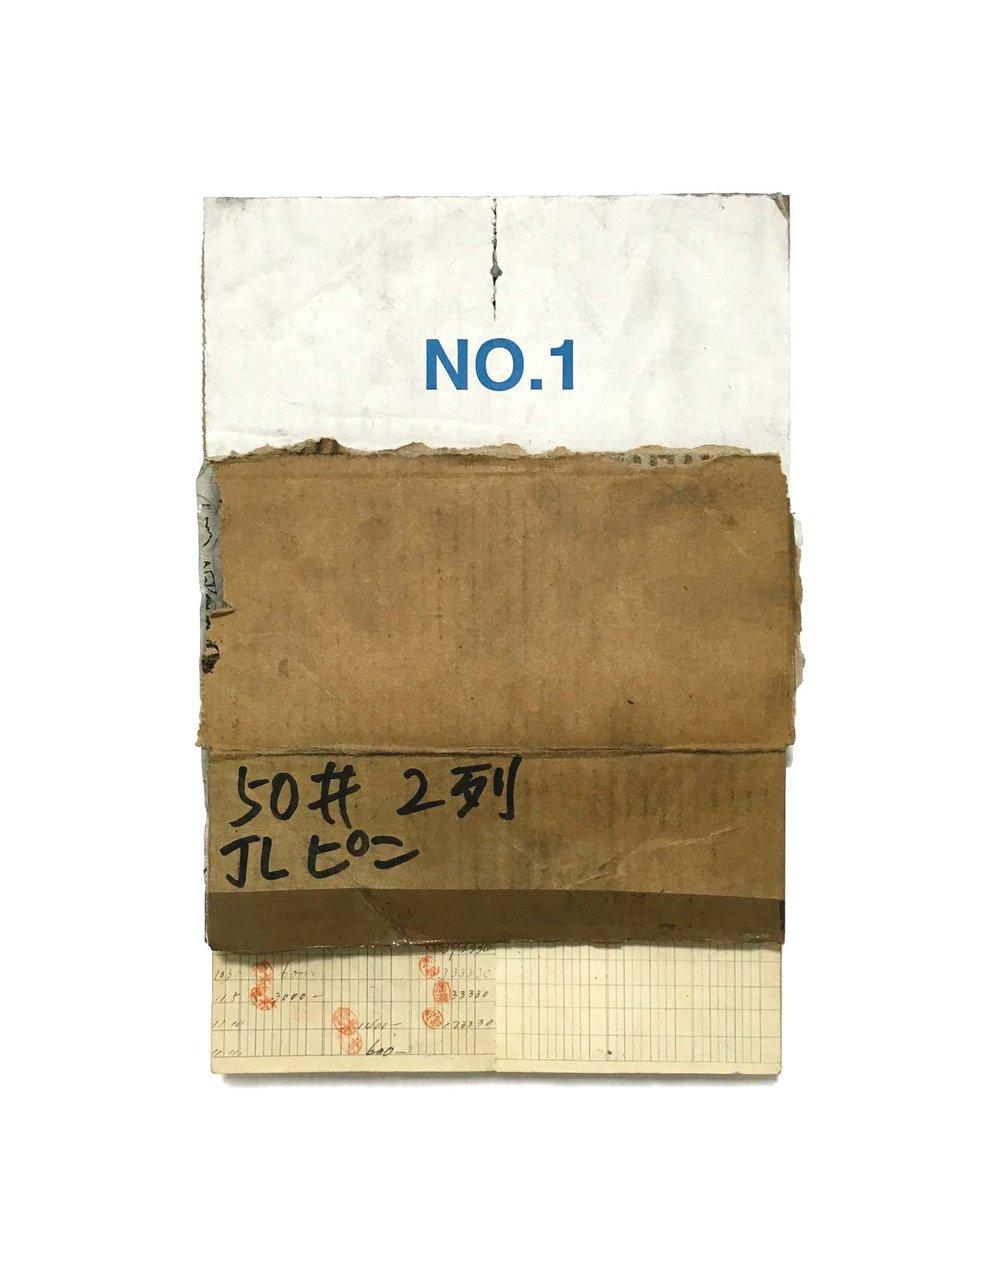 06_NO.1.jpg